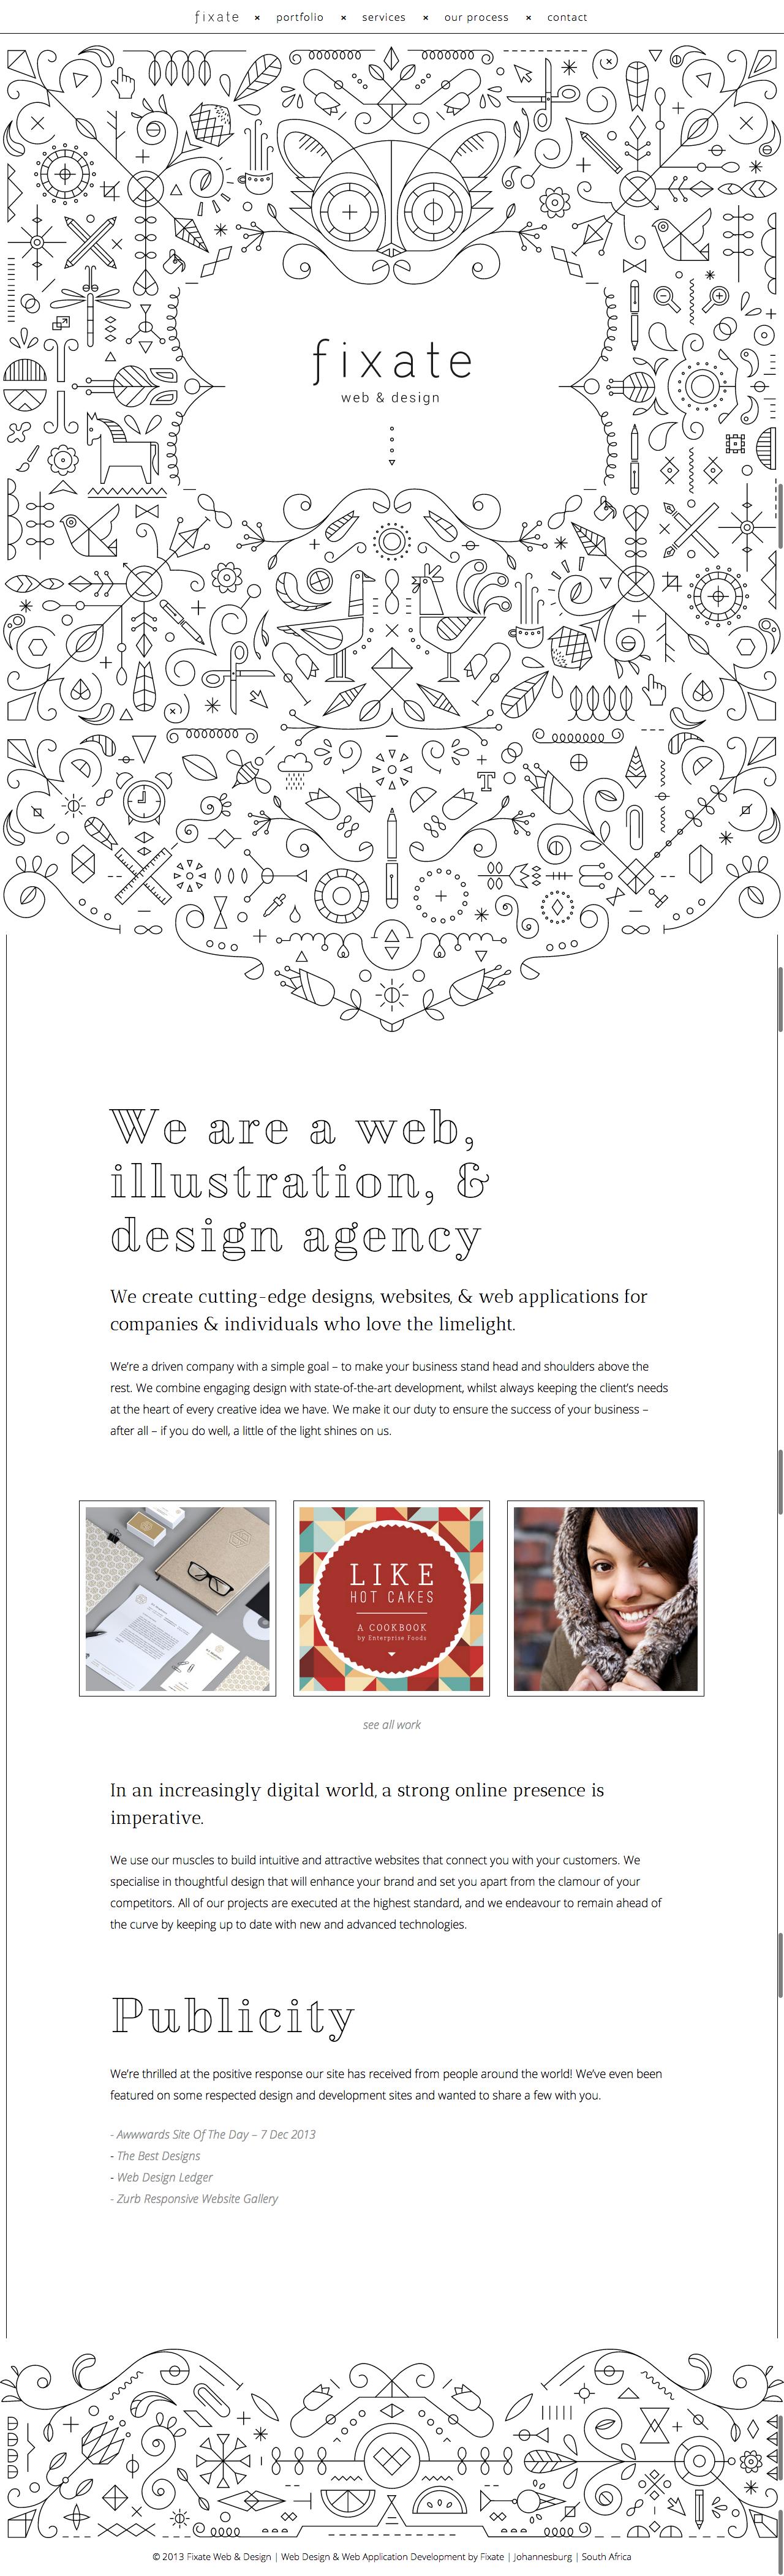 Web Design Agency | SparxITSolutions | India | sparxitsolutions.com